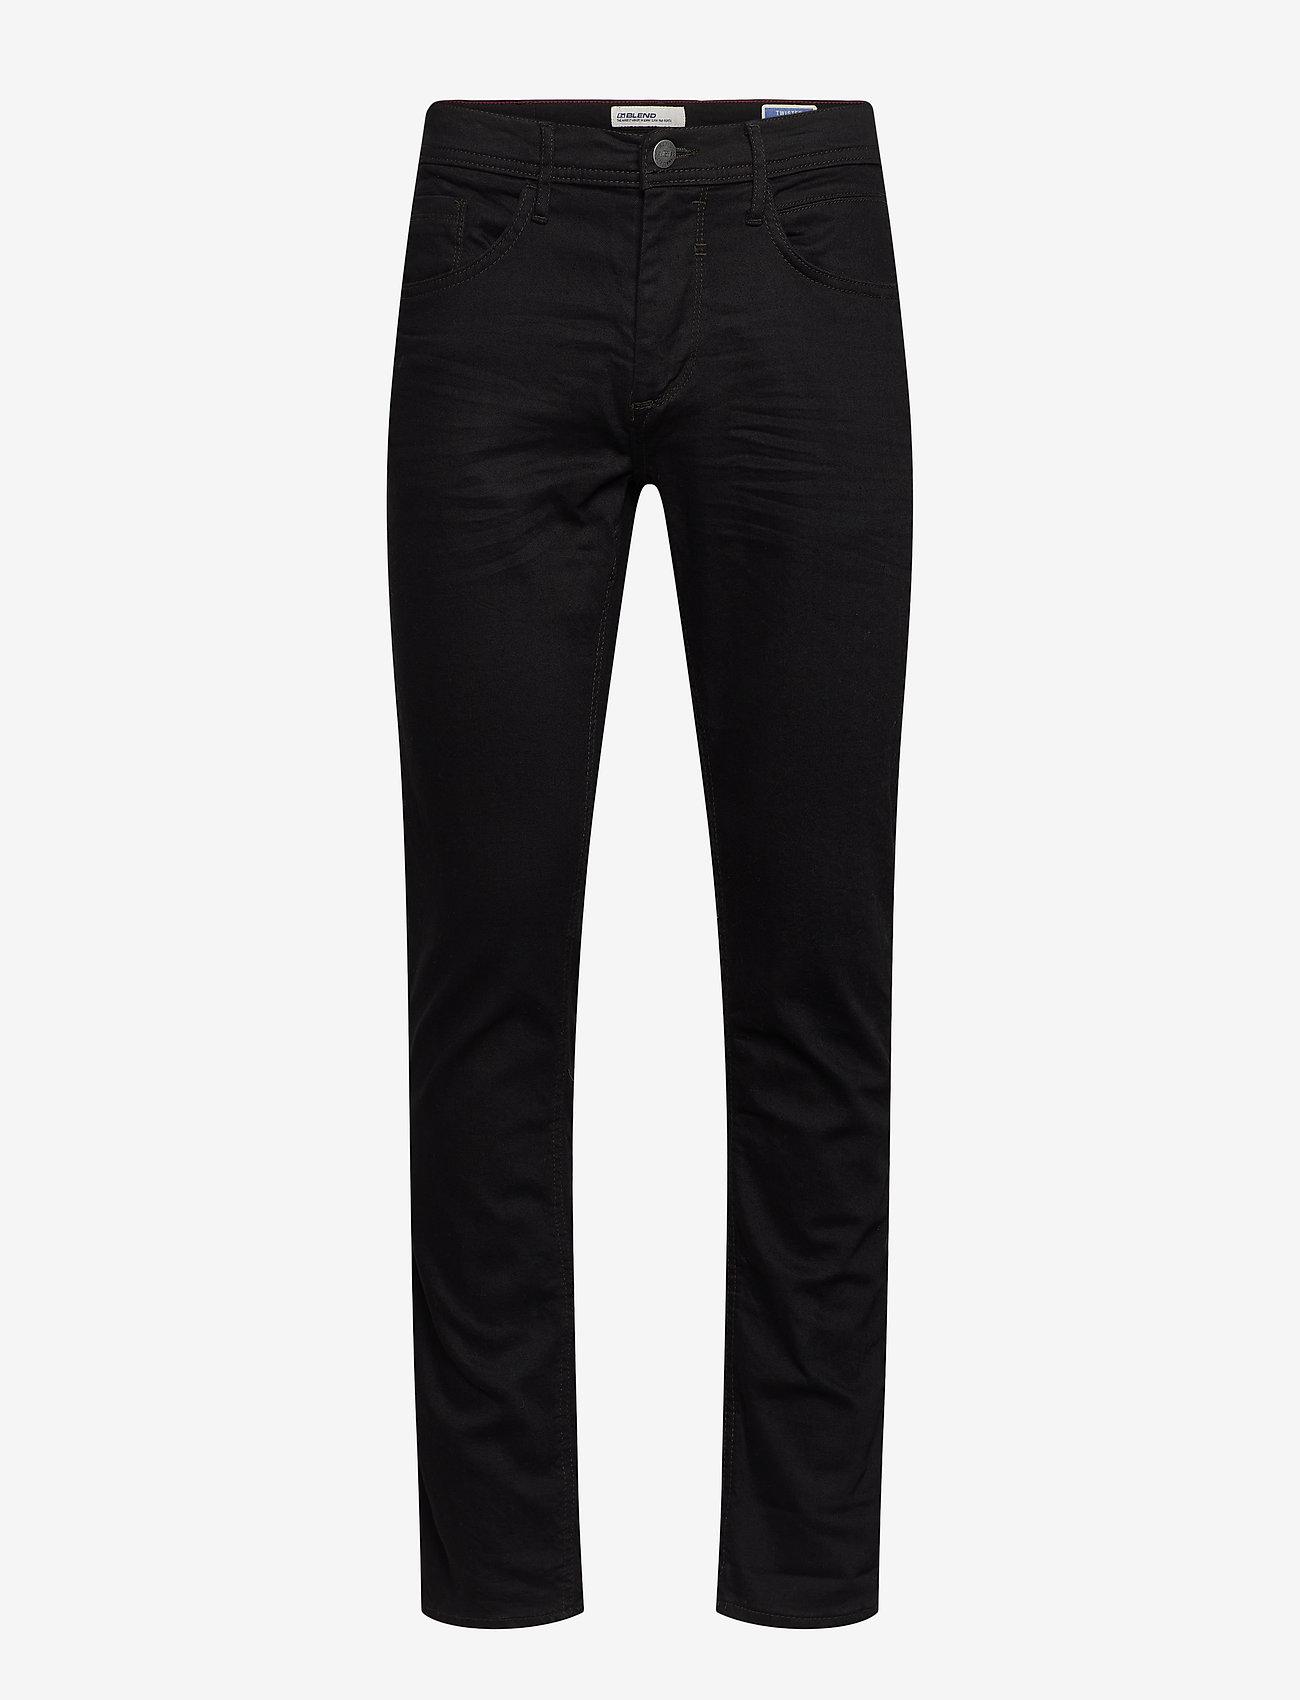 Blend - Twister fit - Clean - regular jeans - denim raw black - 0